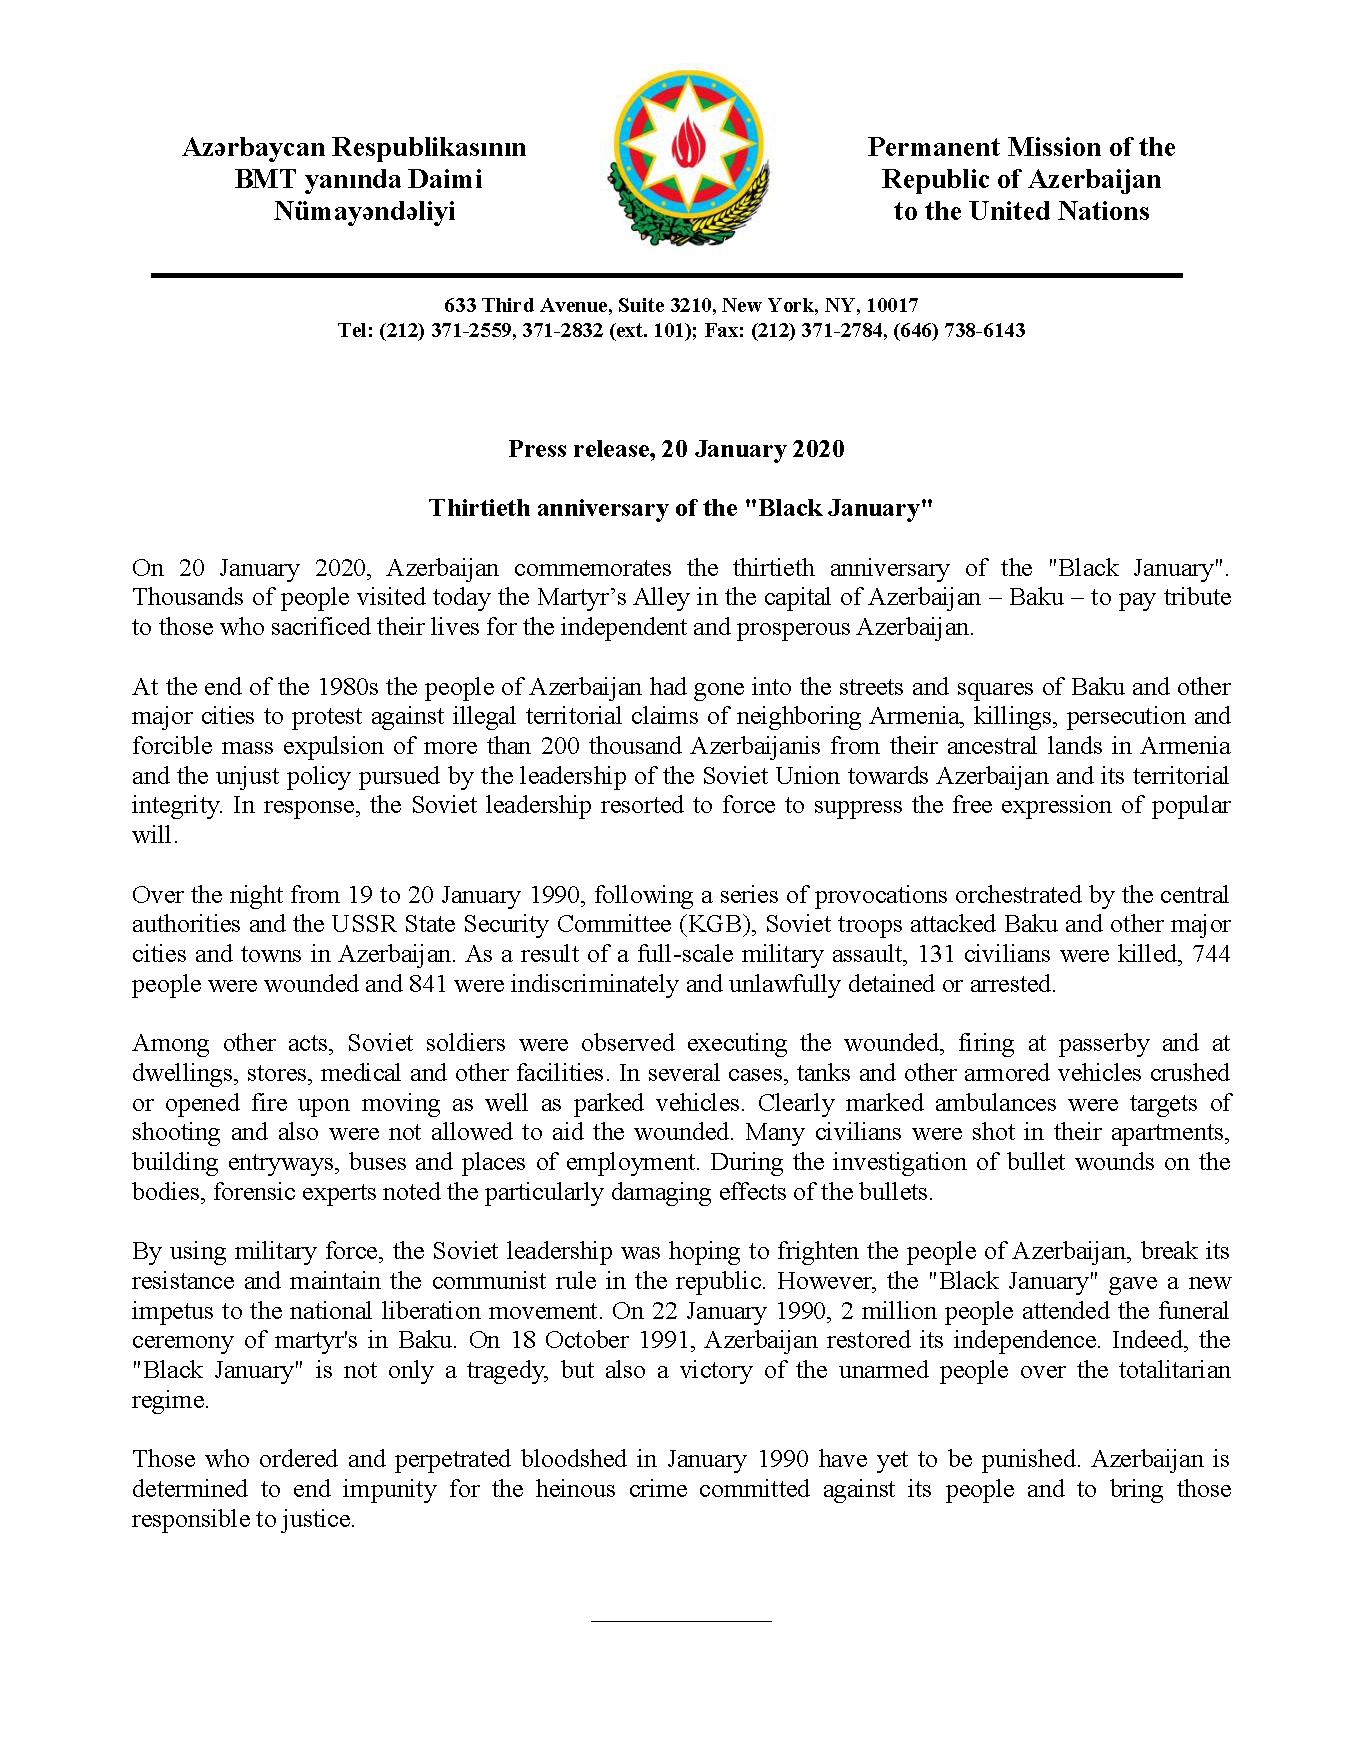 Press release Black January 20.01.20